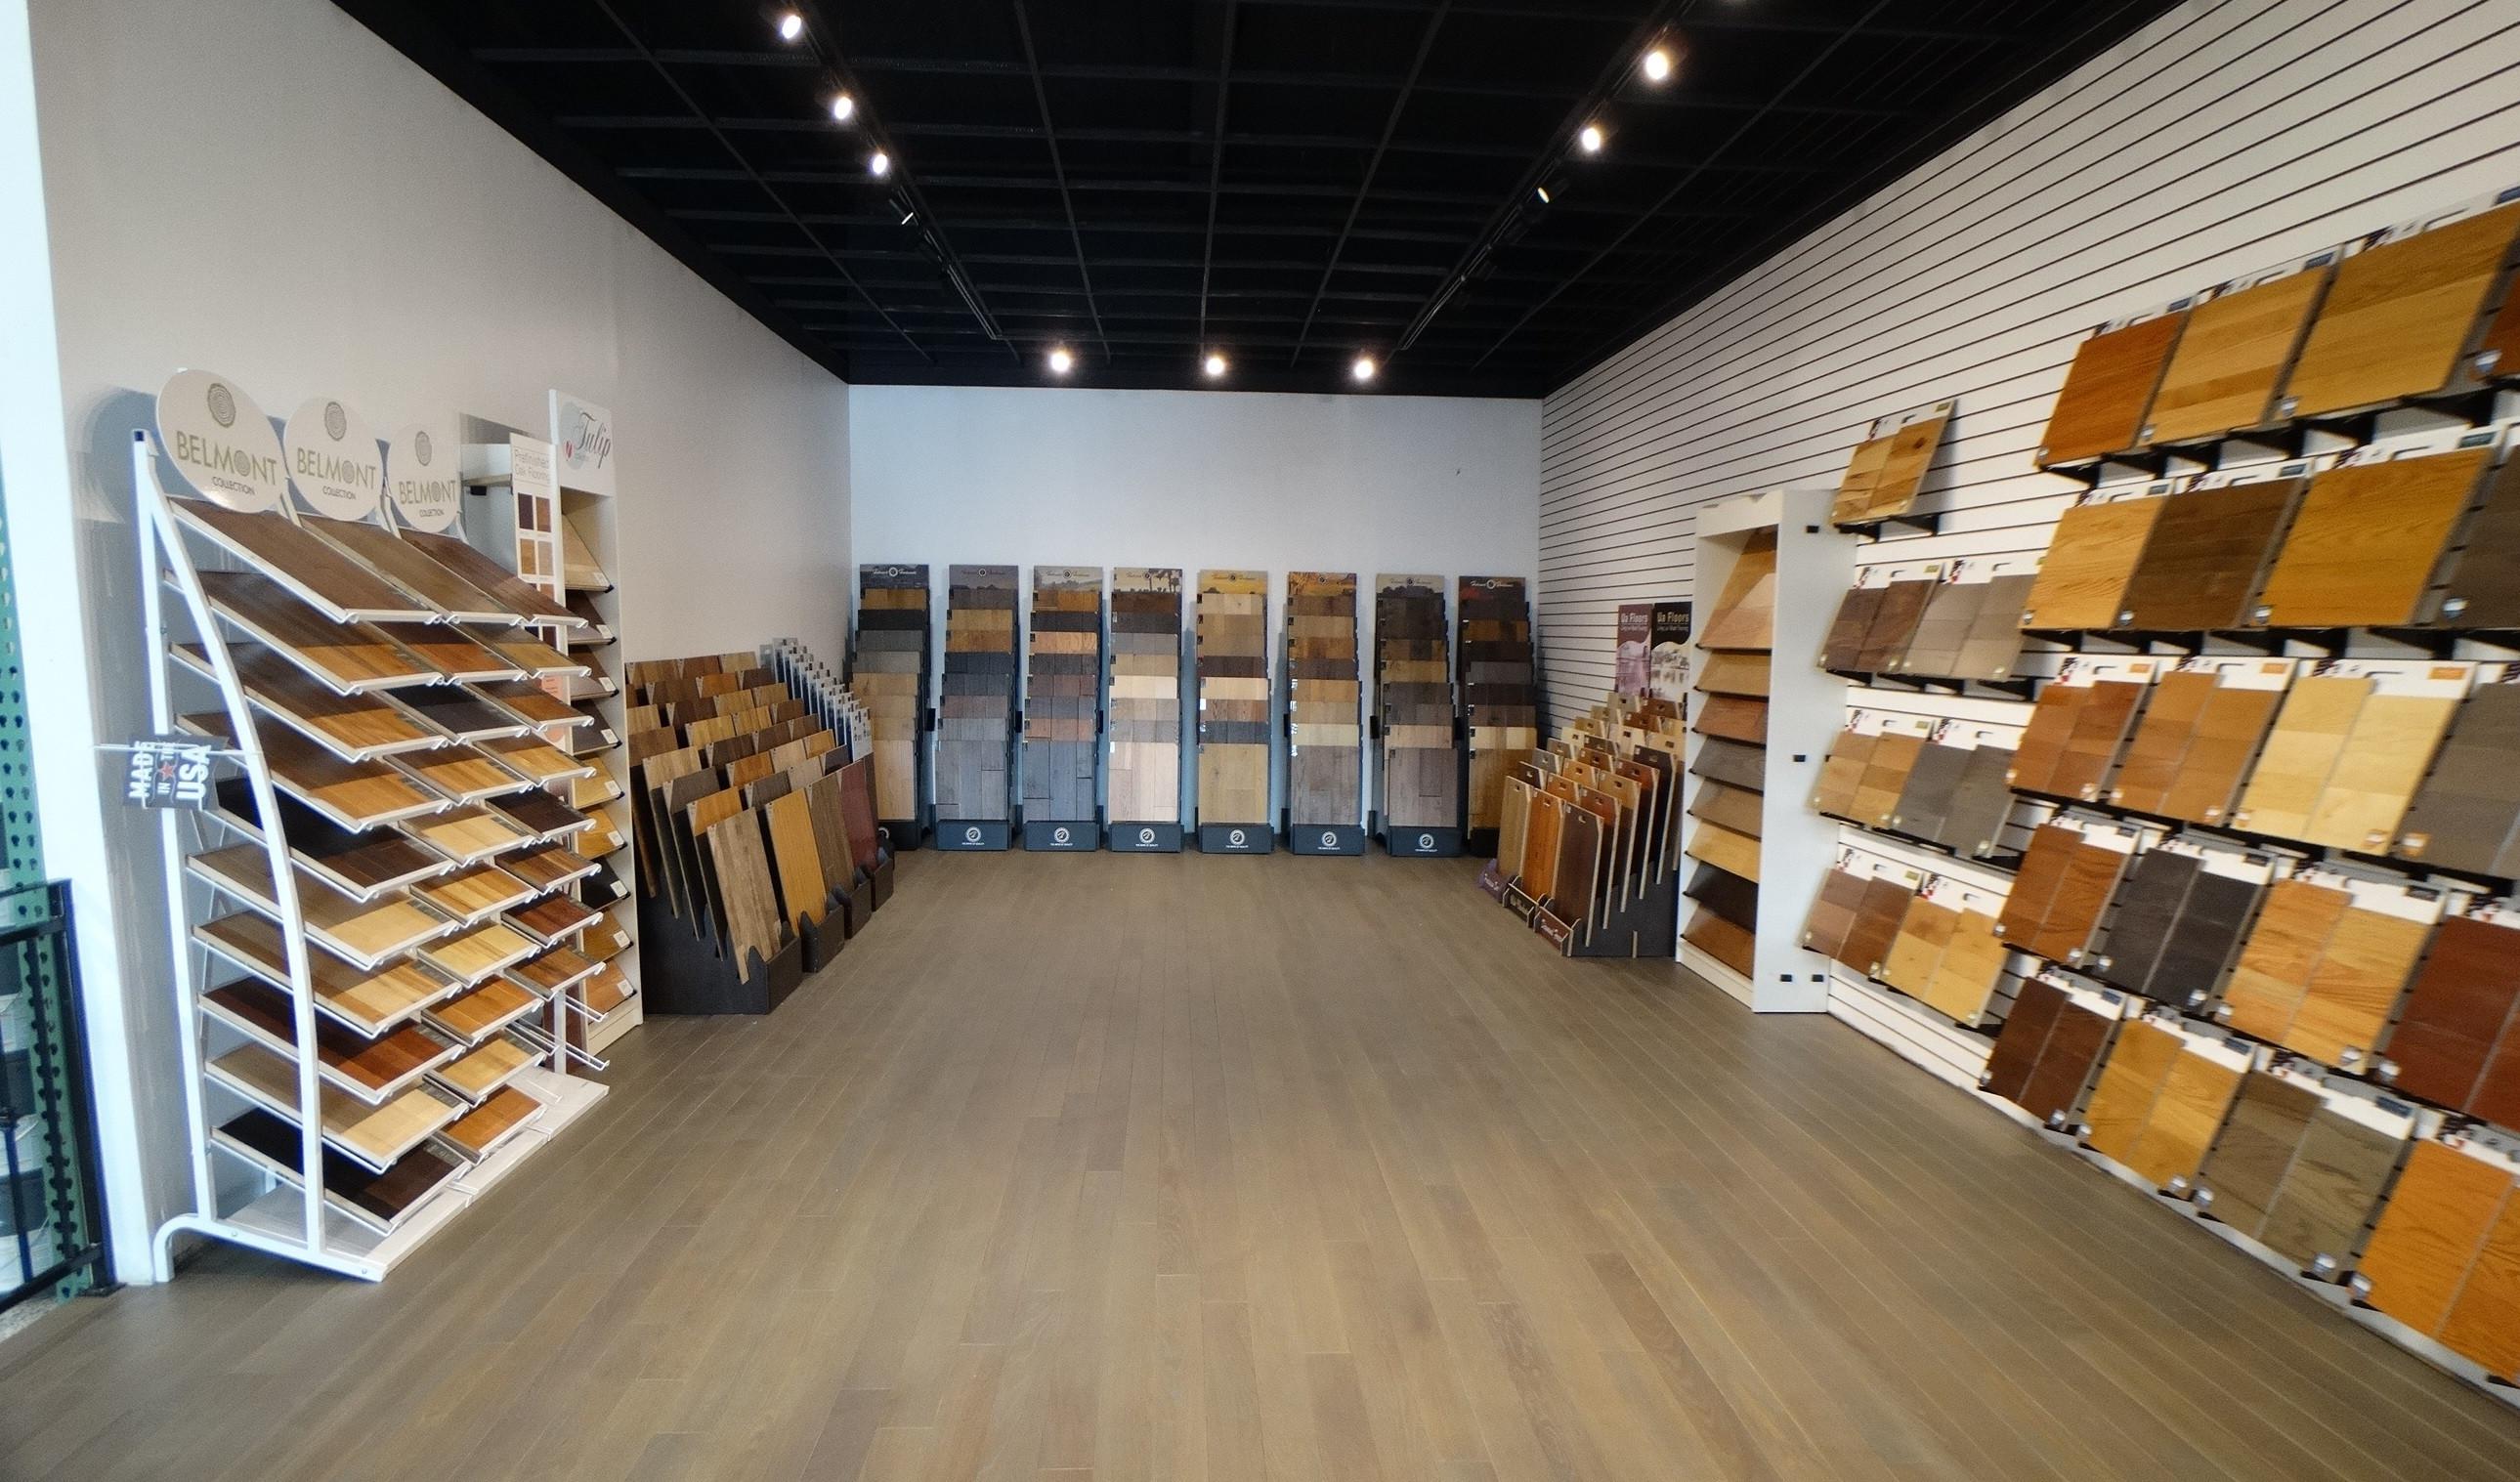 pc hardwood floors waterbury ct of bronx pc hardwood floors regarding customized hardwood flooring services